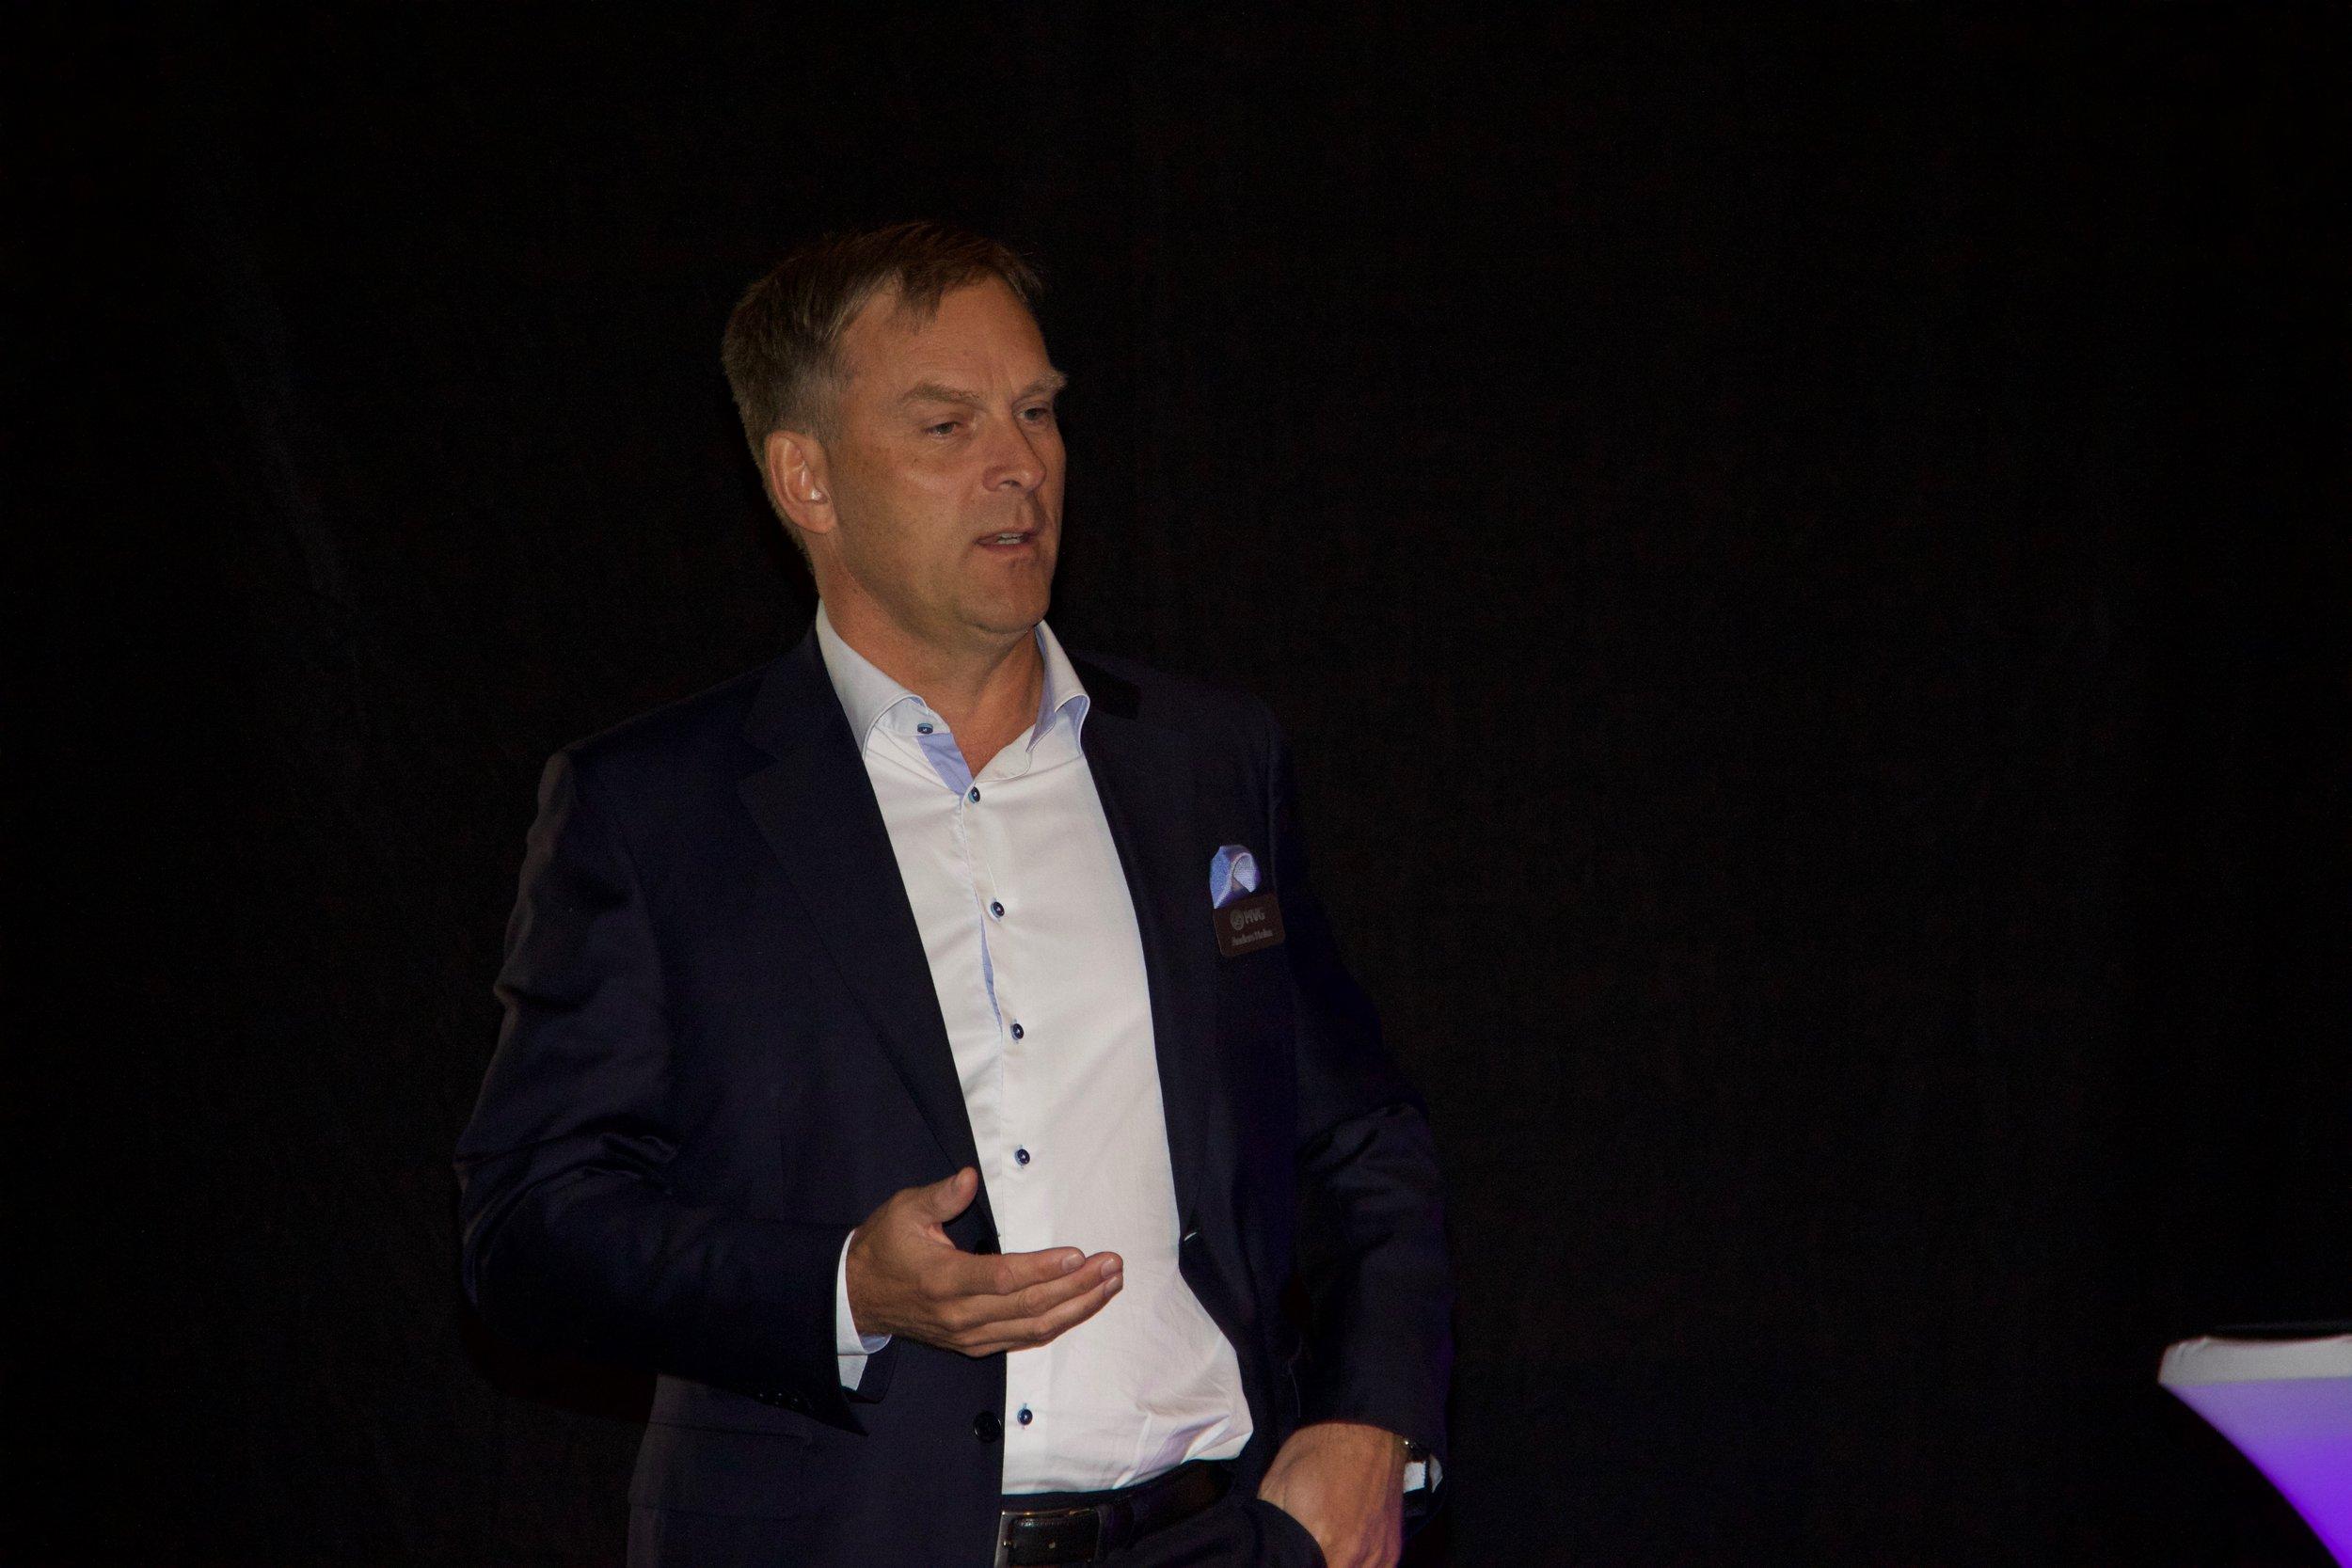 ....MVG CEO Anders holm in introductory speech..Anders holm vd mvg introducerar bakgrunden för mvg....